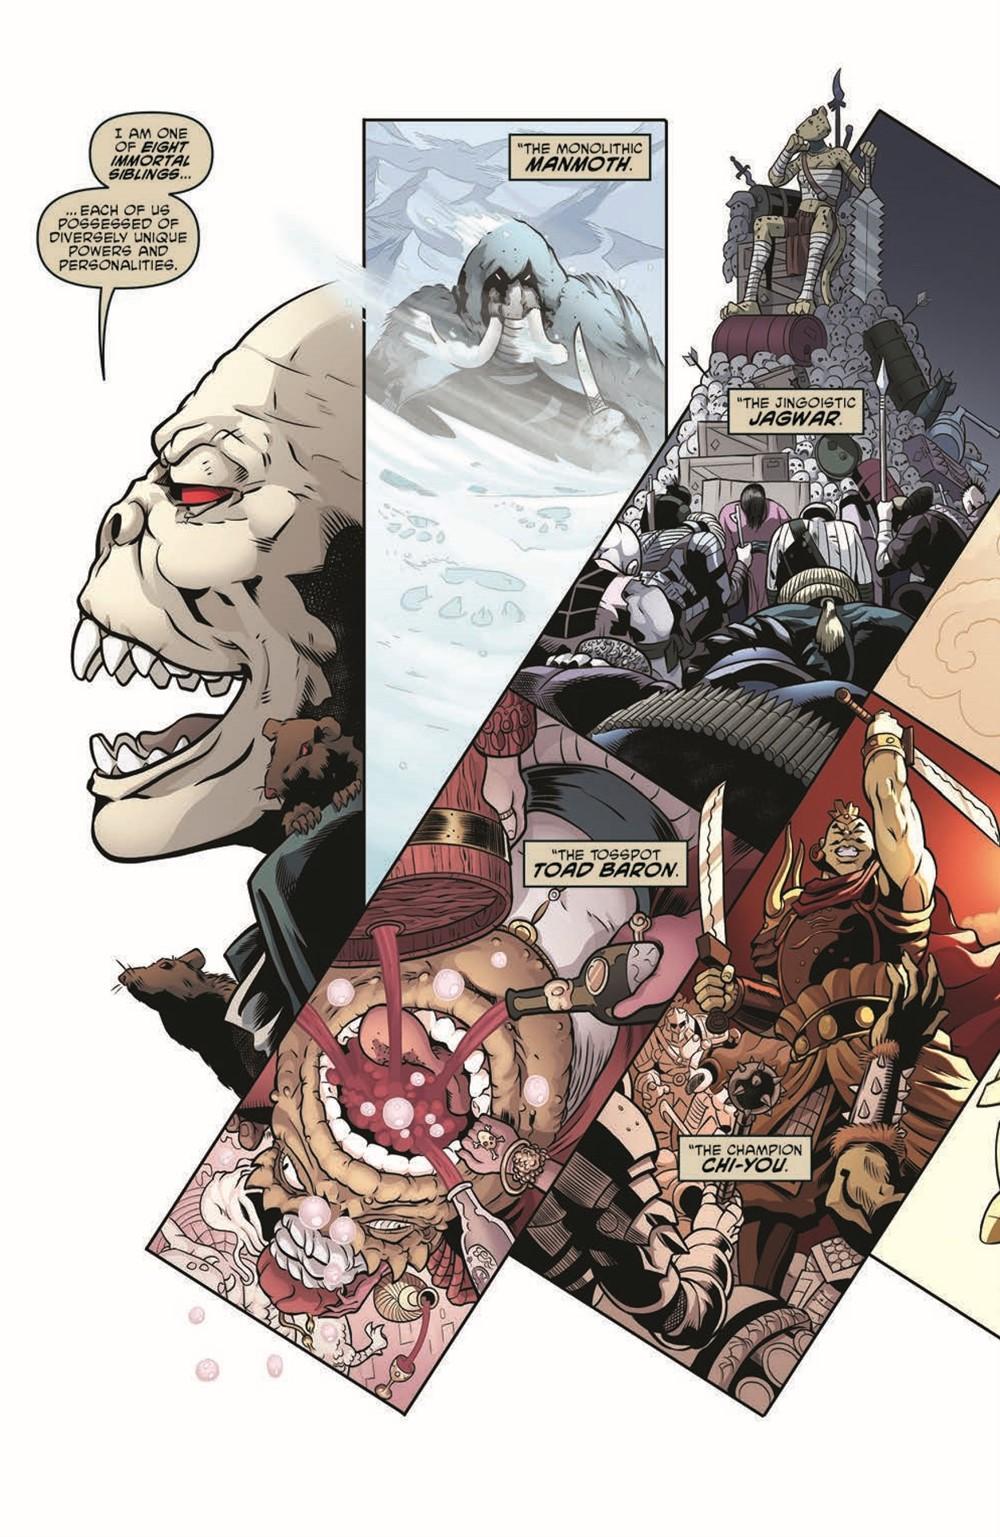 TMNT-Annual2021_pr-4 ComicList Previews: TEENAGE MUTANT NINJA TURTLES ANNUAL 2021